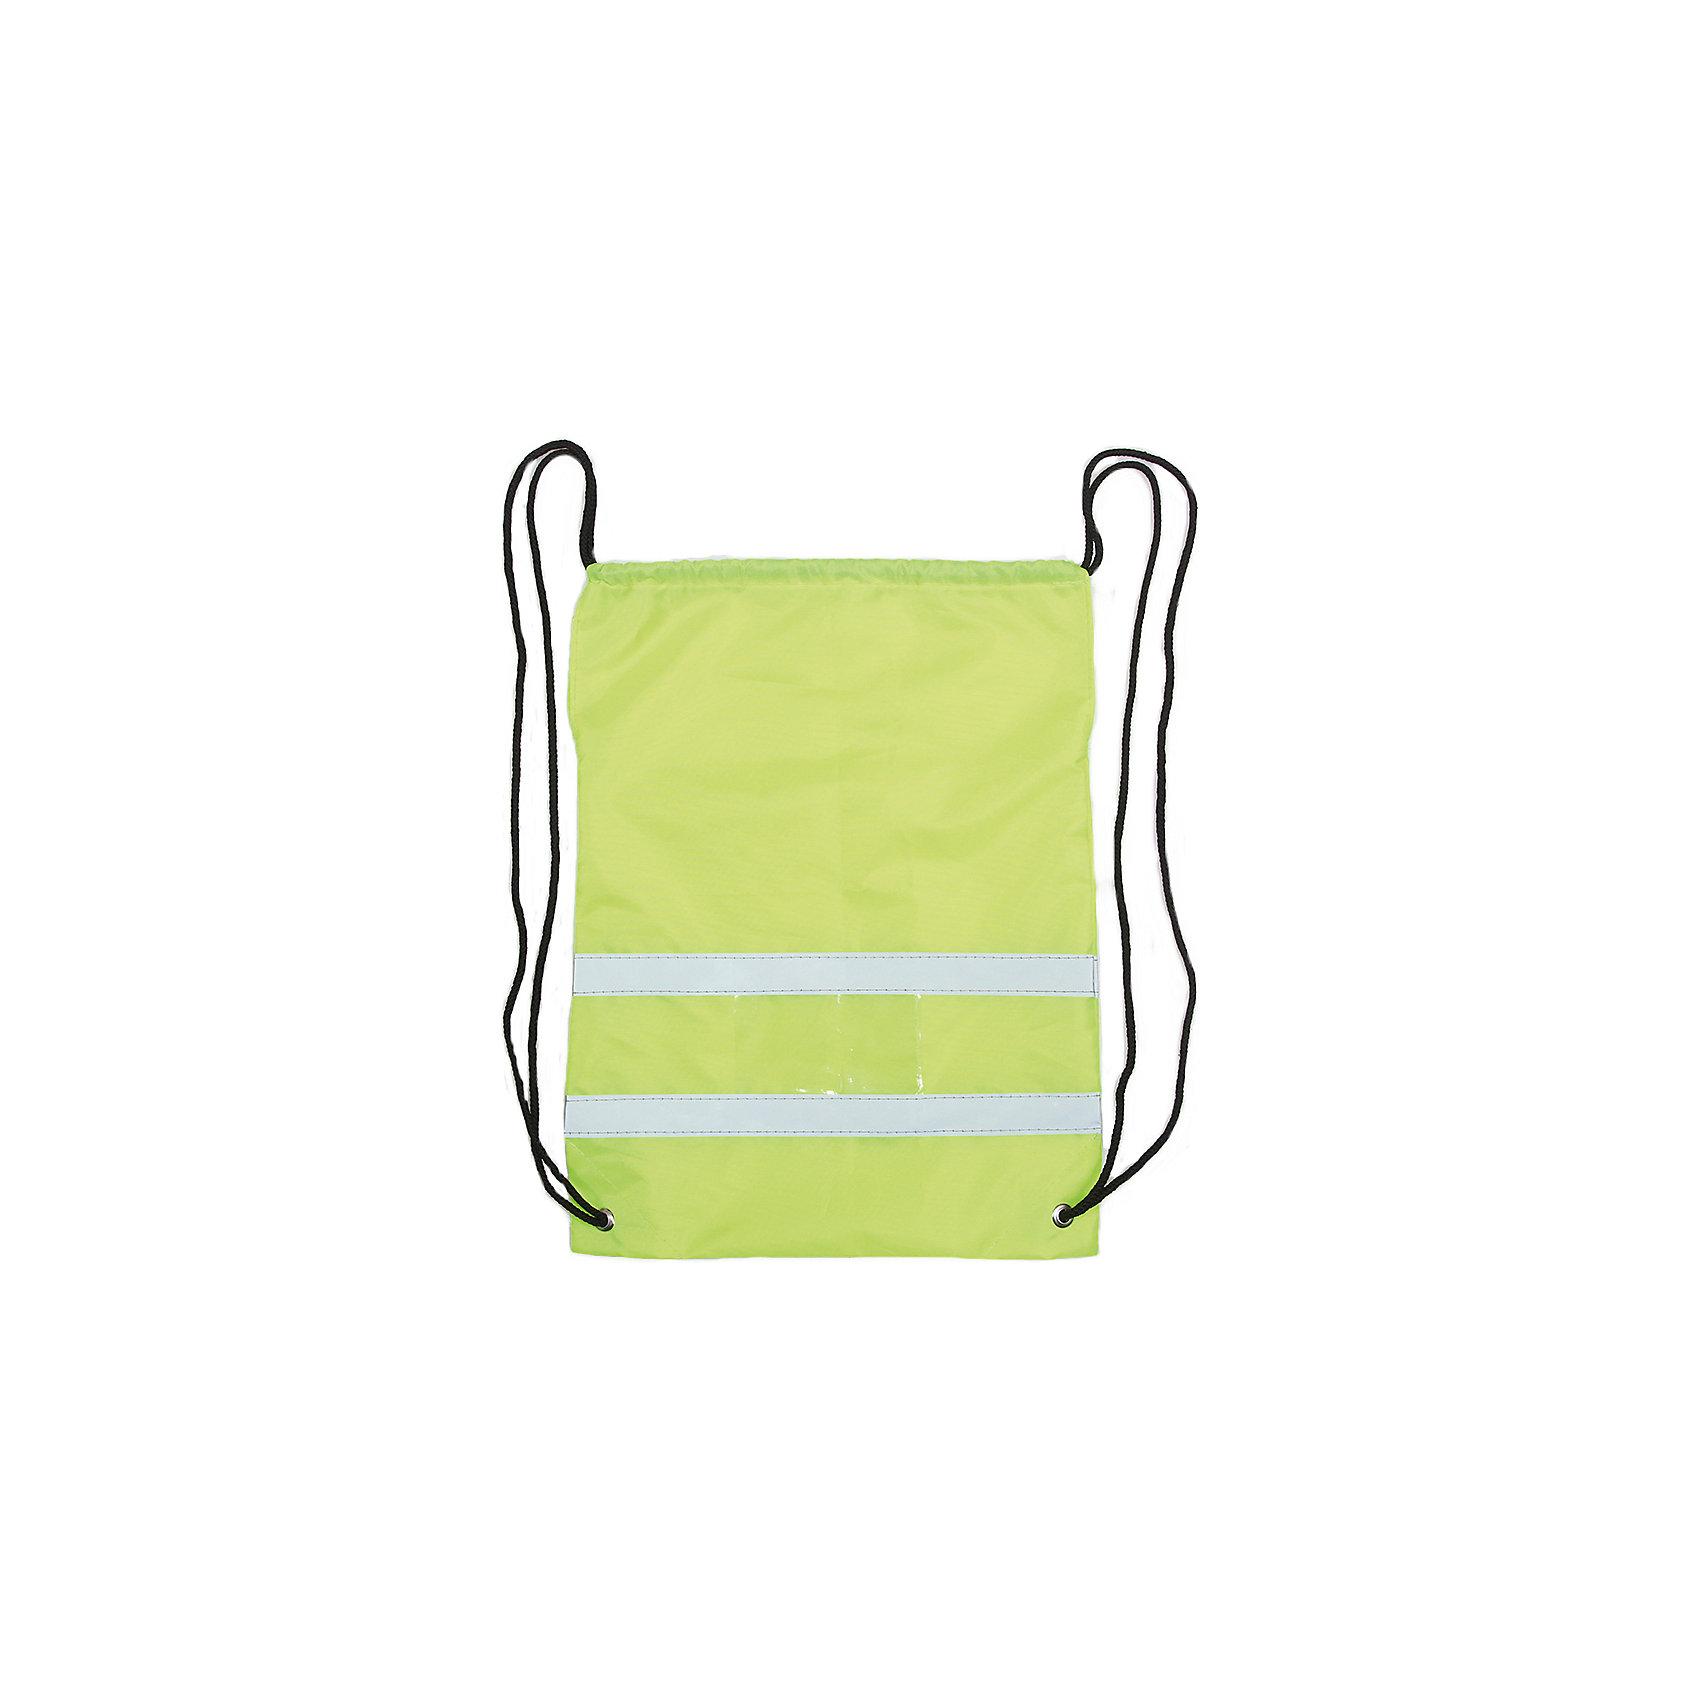 - Мешок для обуви со светоотражающими элементами жилет со светоотражающими полосами airline arw av 02